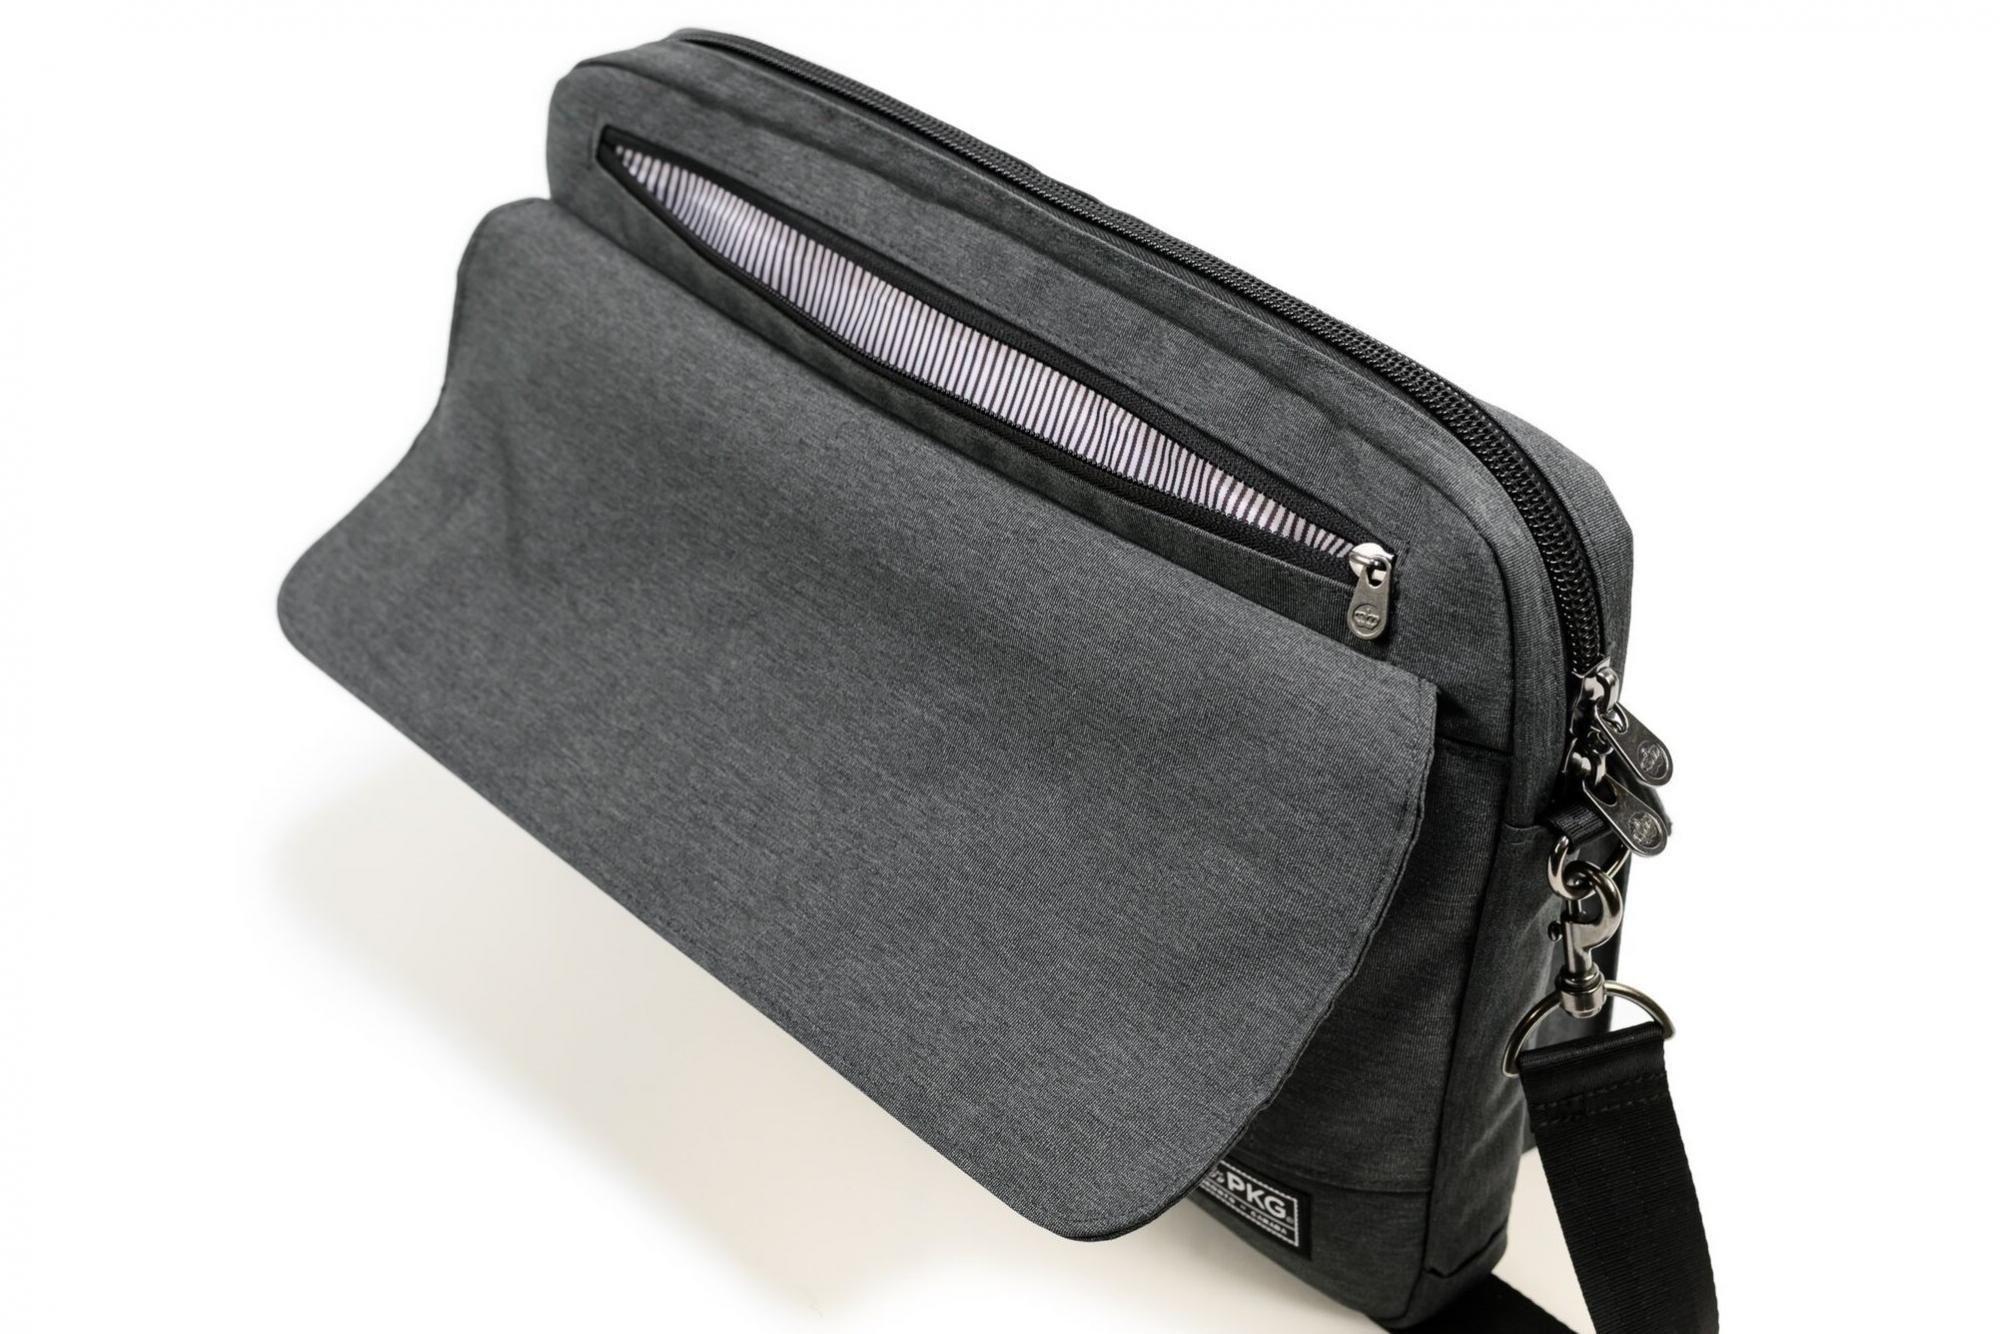 Torba richmond laptop messenger (PKG-RICH-GY01TN) za prenosnik poslovna neformalna organizirana